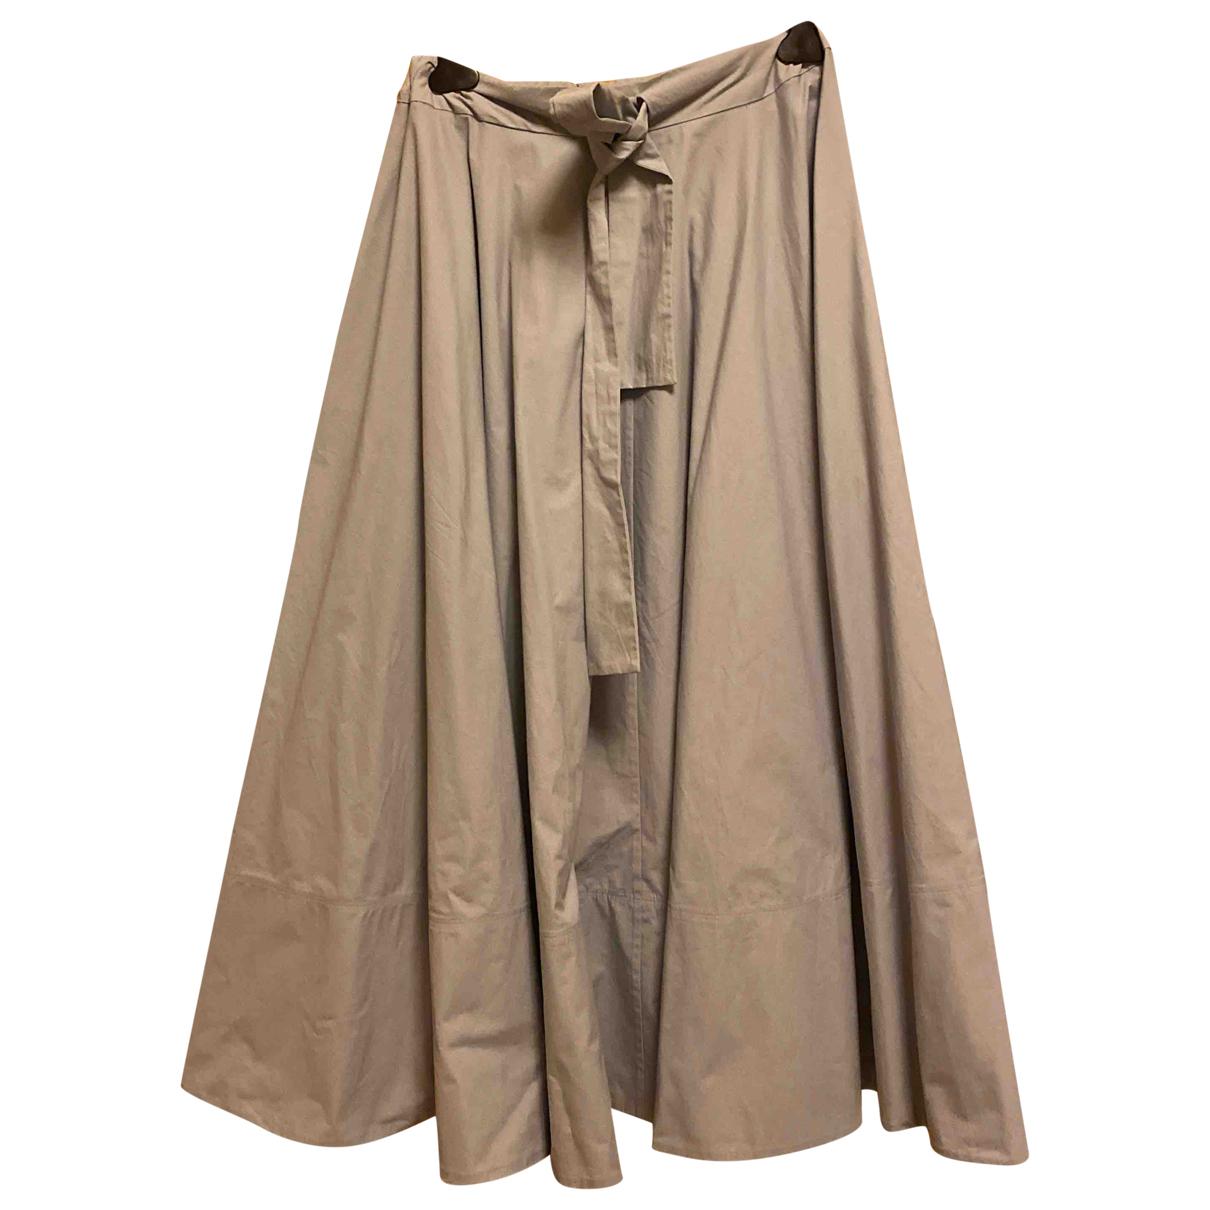 Co N Blue Cotton skirt for Women XS International